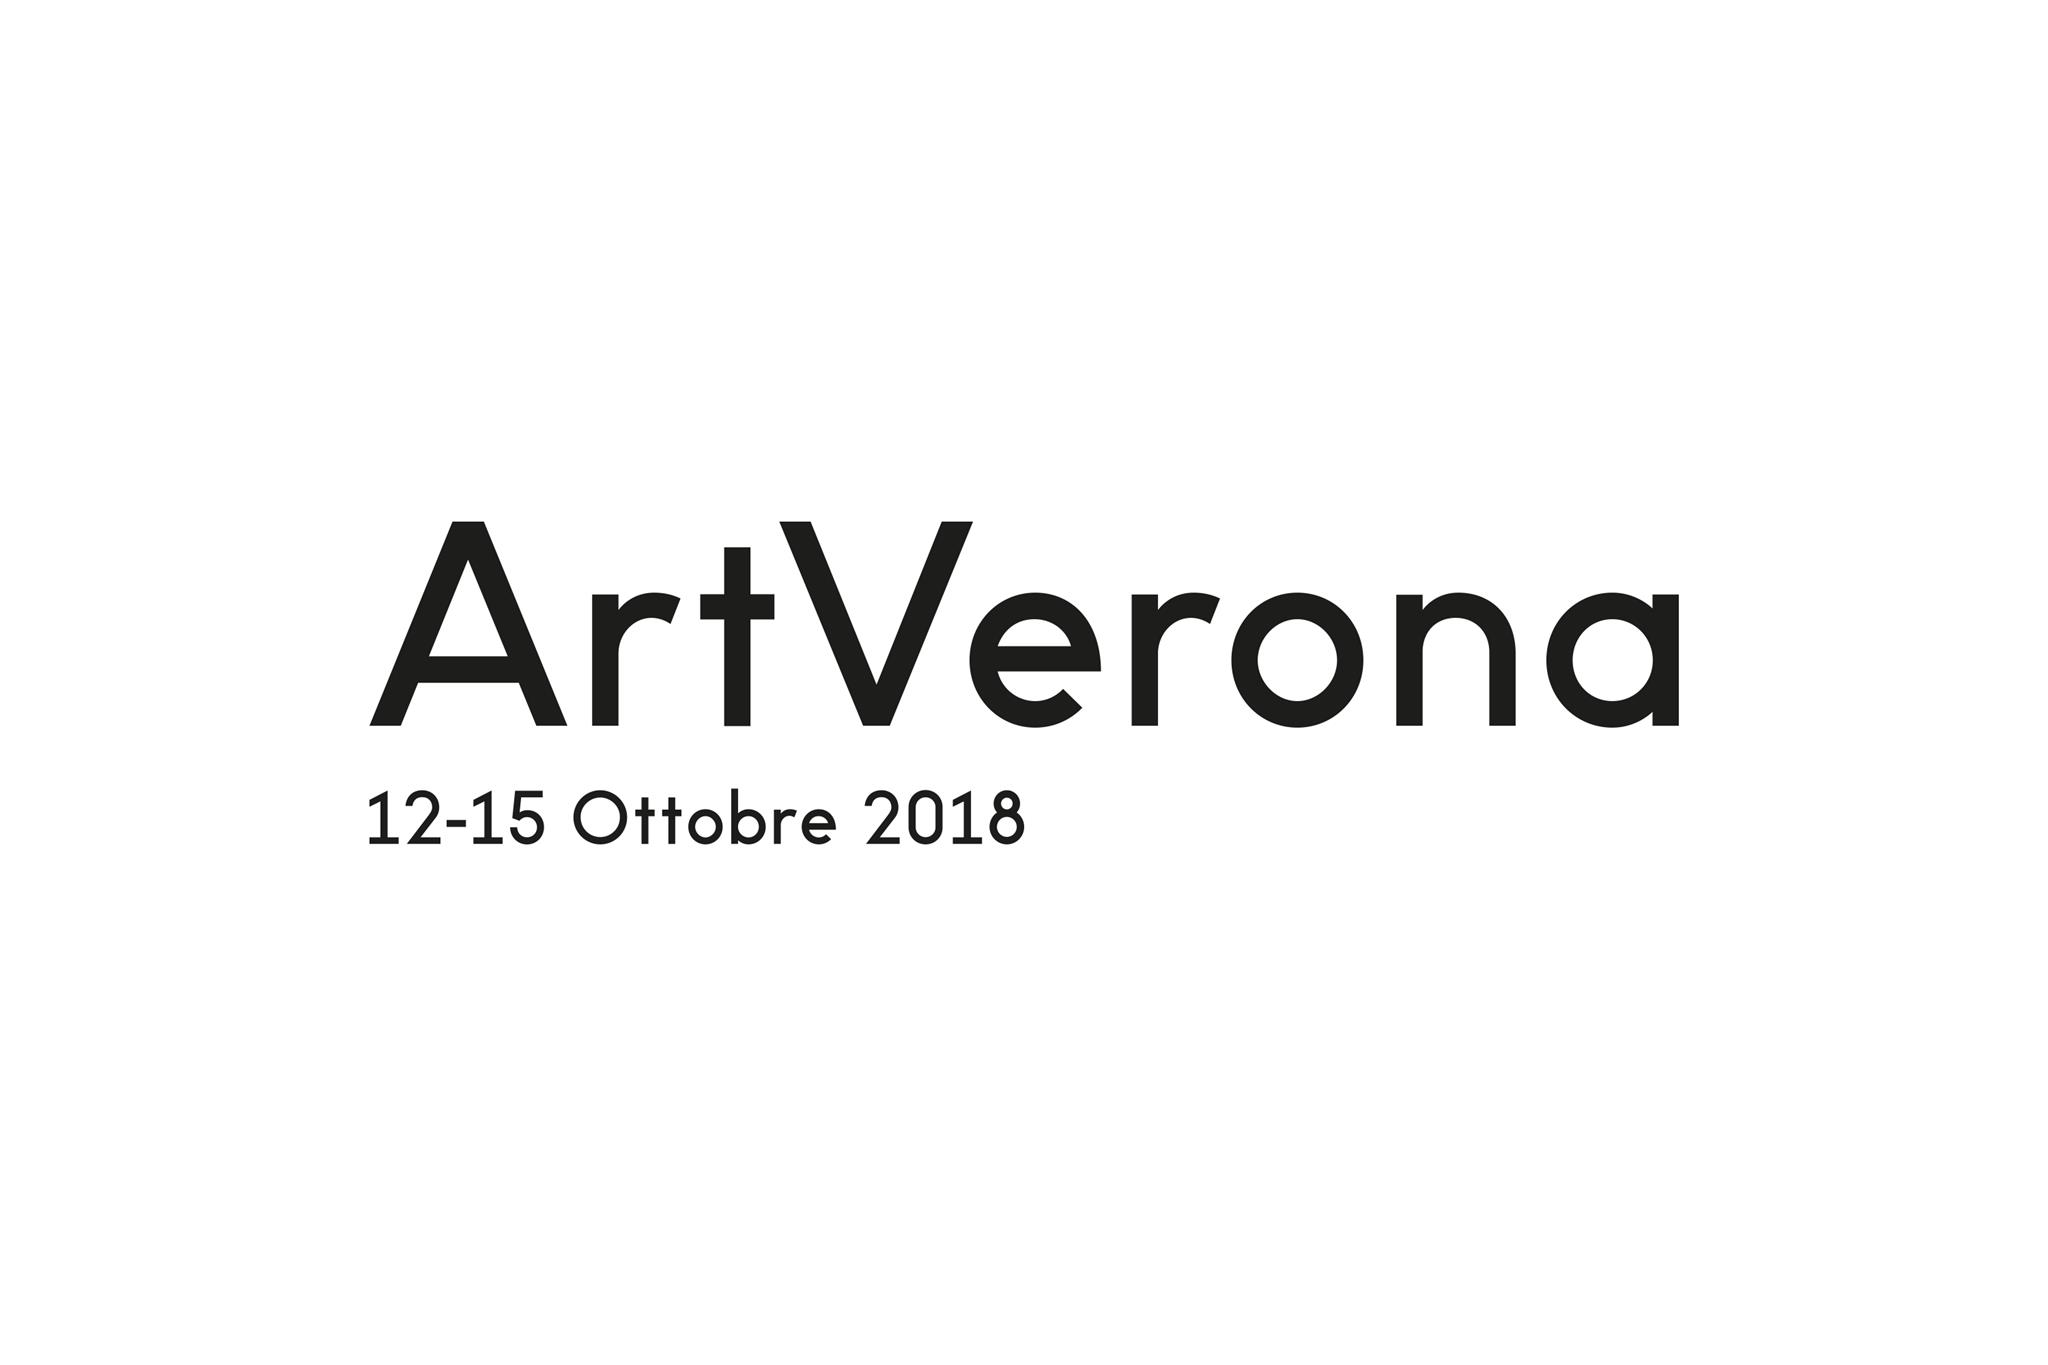 ArtVerona_Logotype_date